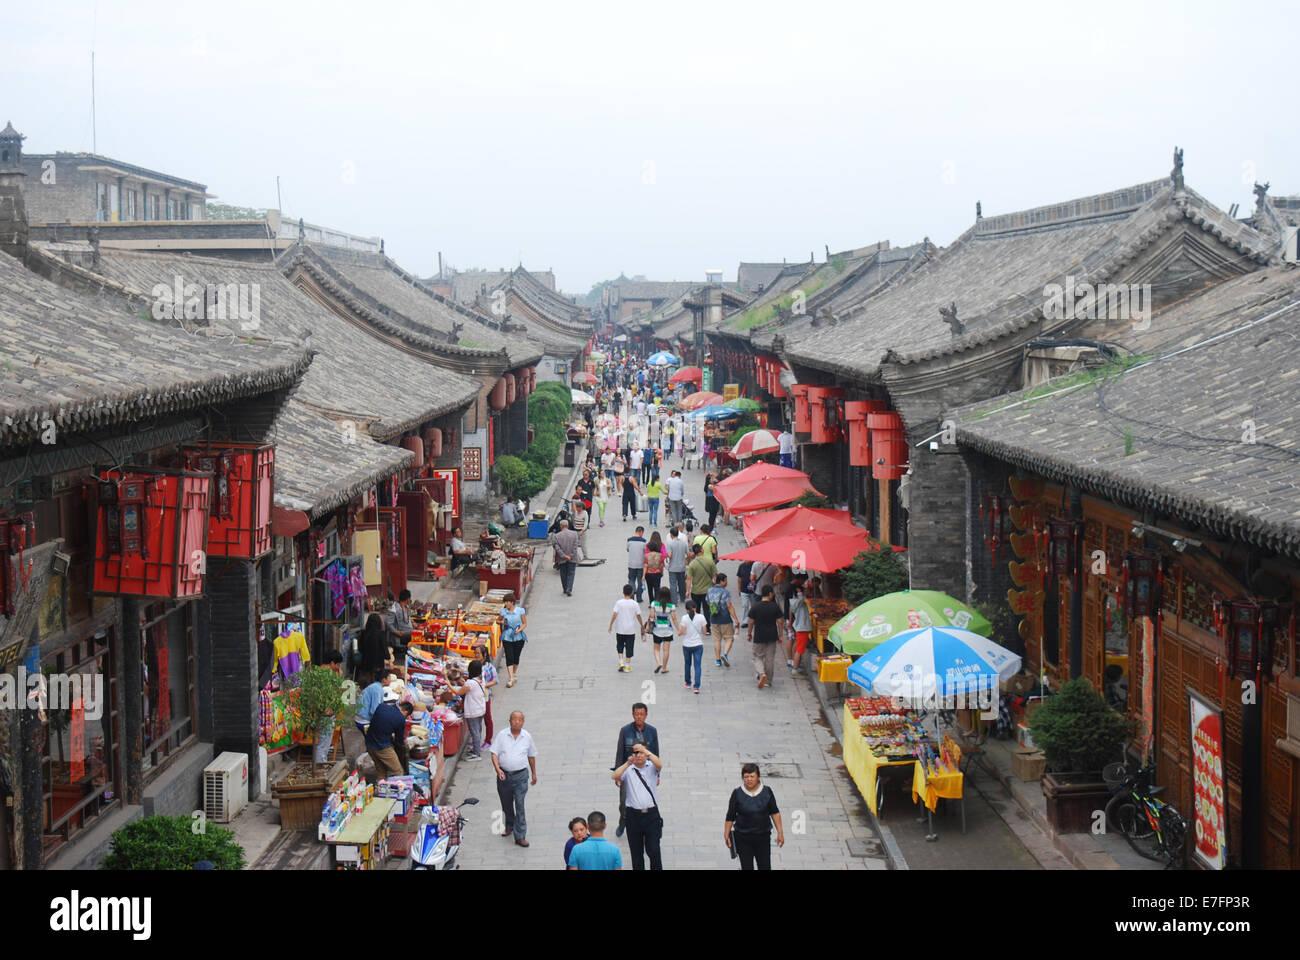 Pingyao, Shanxi province, China 2014 Stock Photo